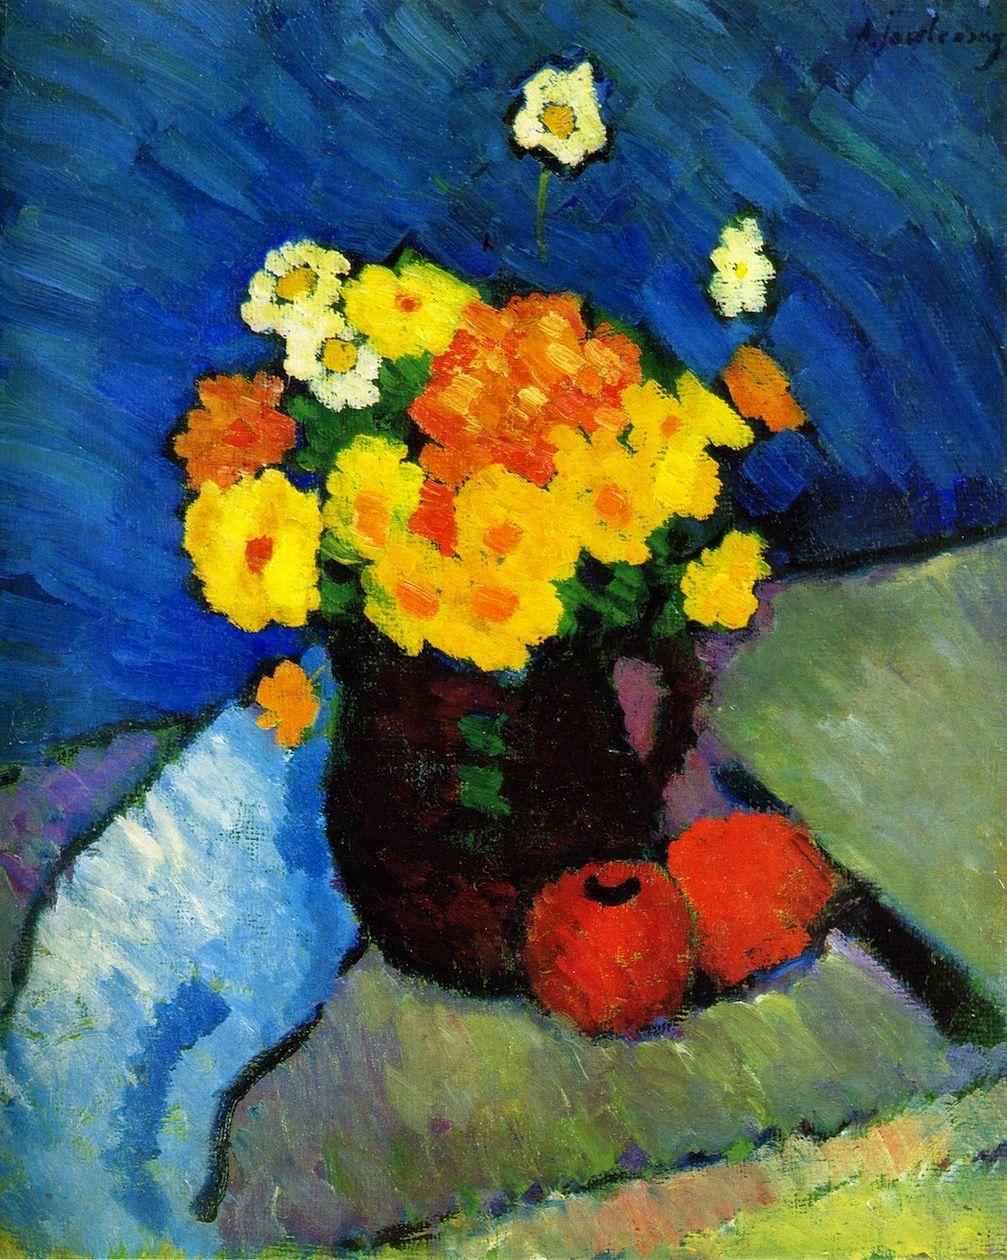 Alexei Jawlensky Floral Life 1910 Expressionism Blaue Reiter Kandinsky